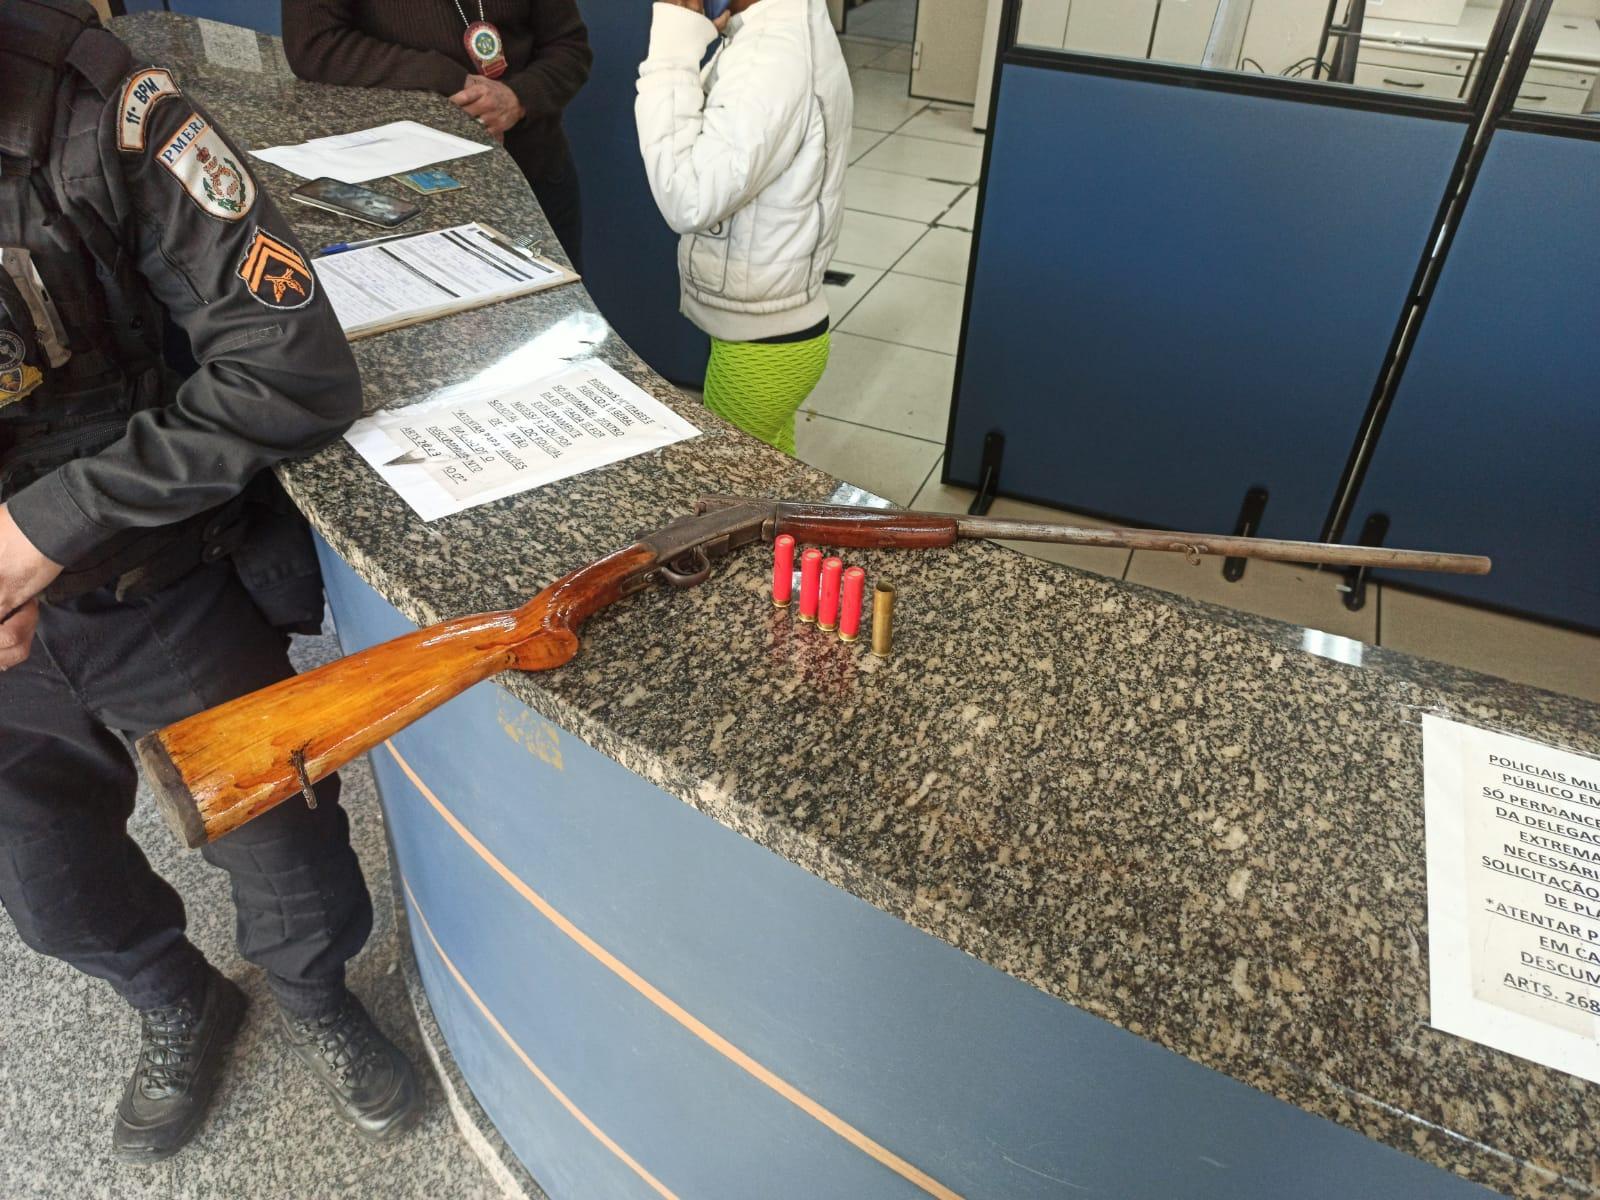 A arma apreendida (Foto: 11 BPM)